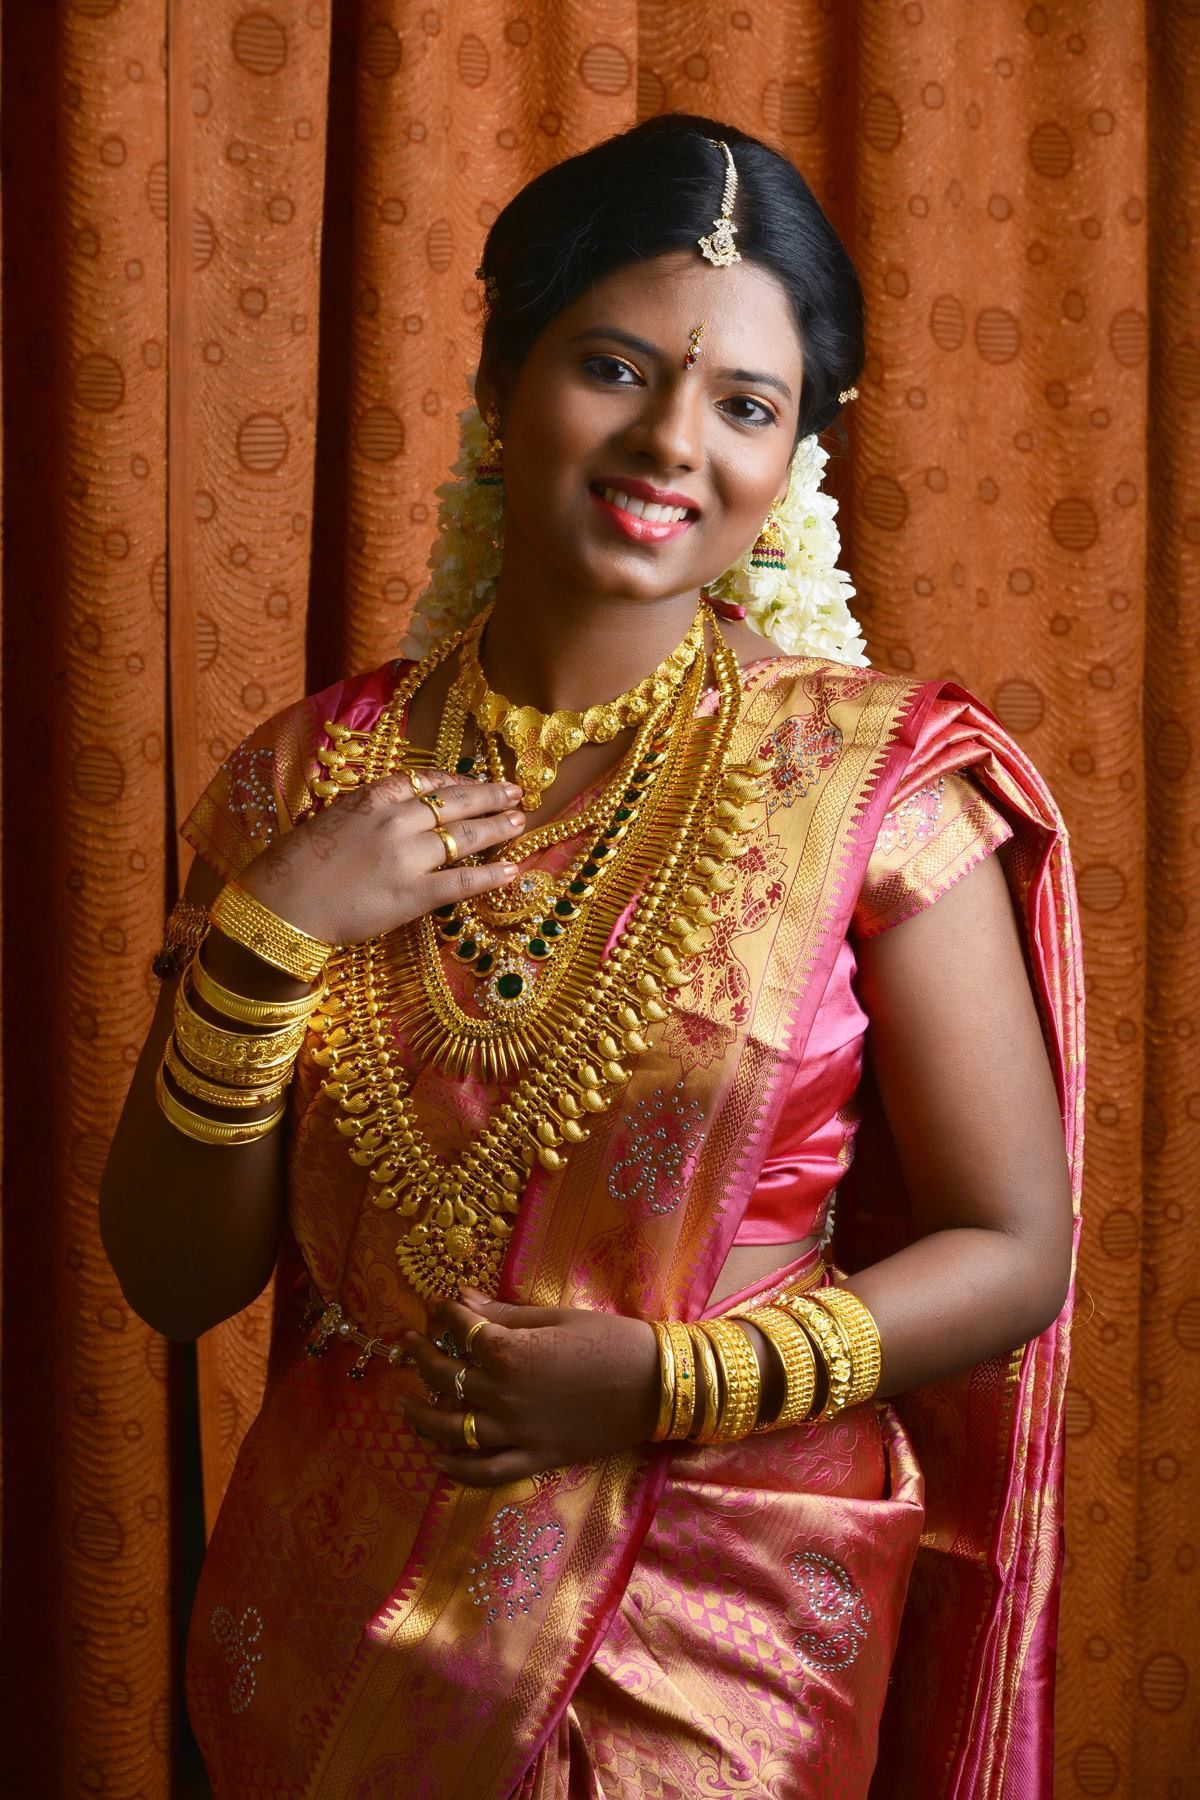 indian wedding wedding bells south Indian bridal